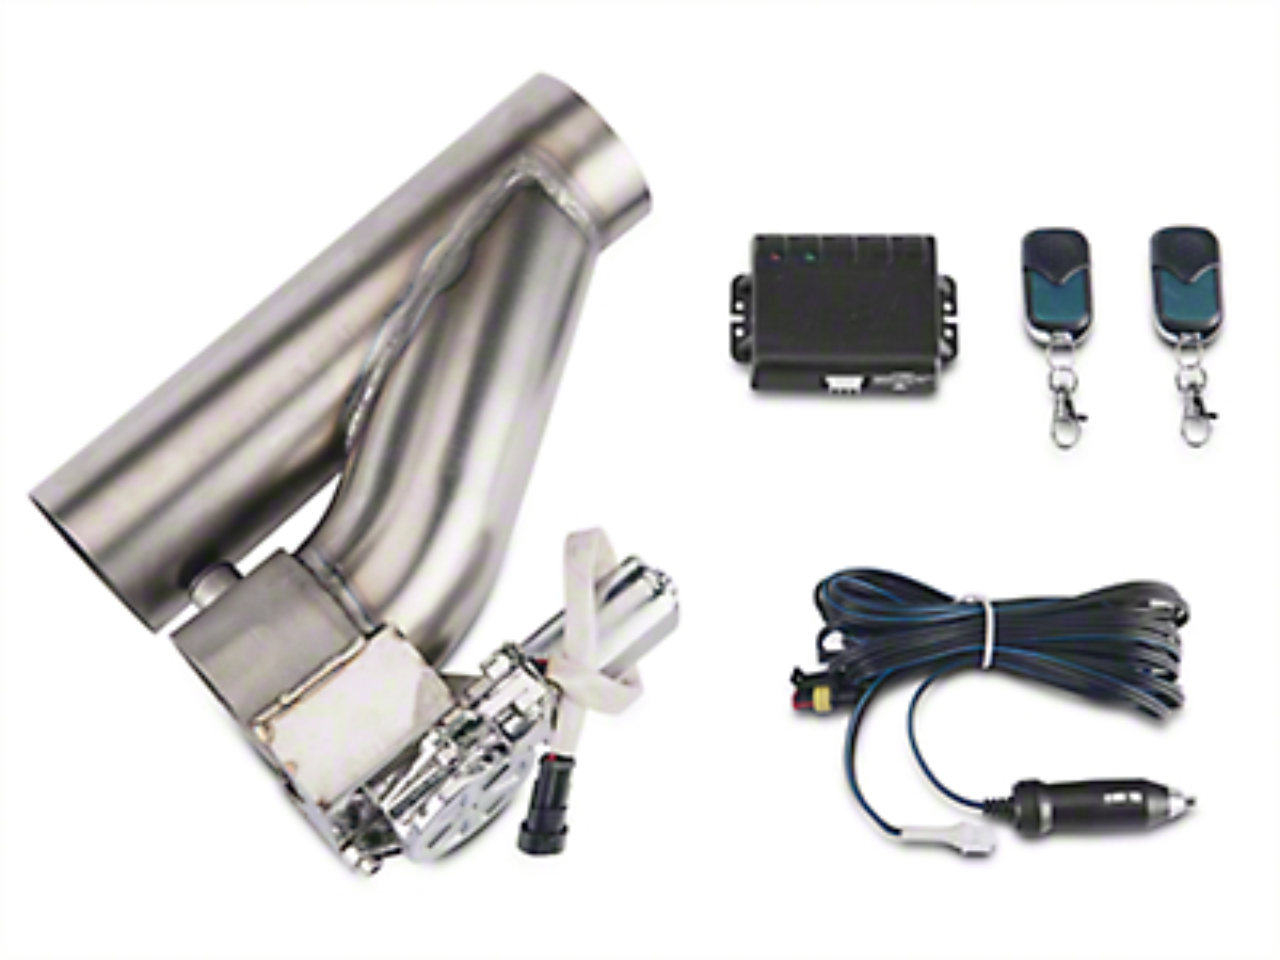 X-Force Electronic Exhaust Cutout Kit - 3 in. (87-18 Wrangler YJ, TJ & JK)